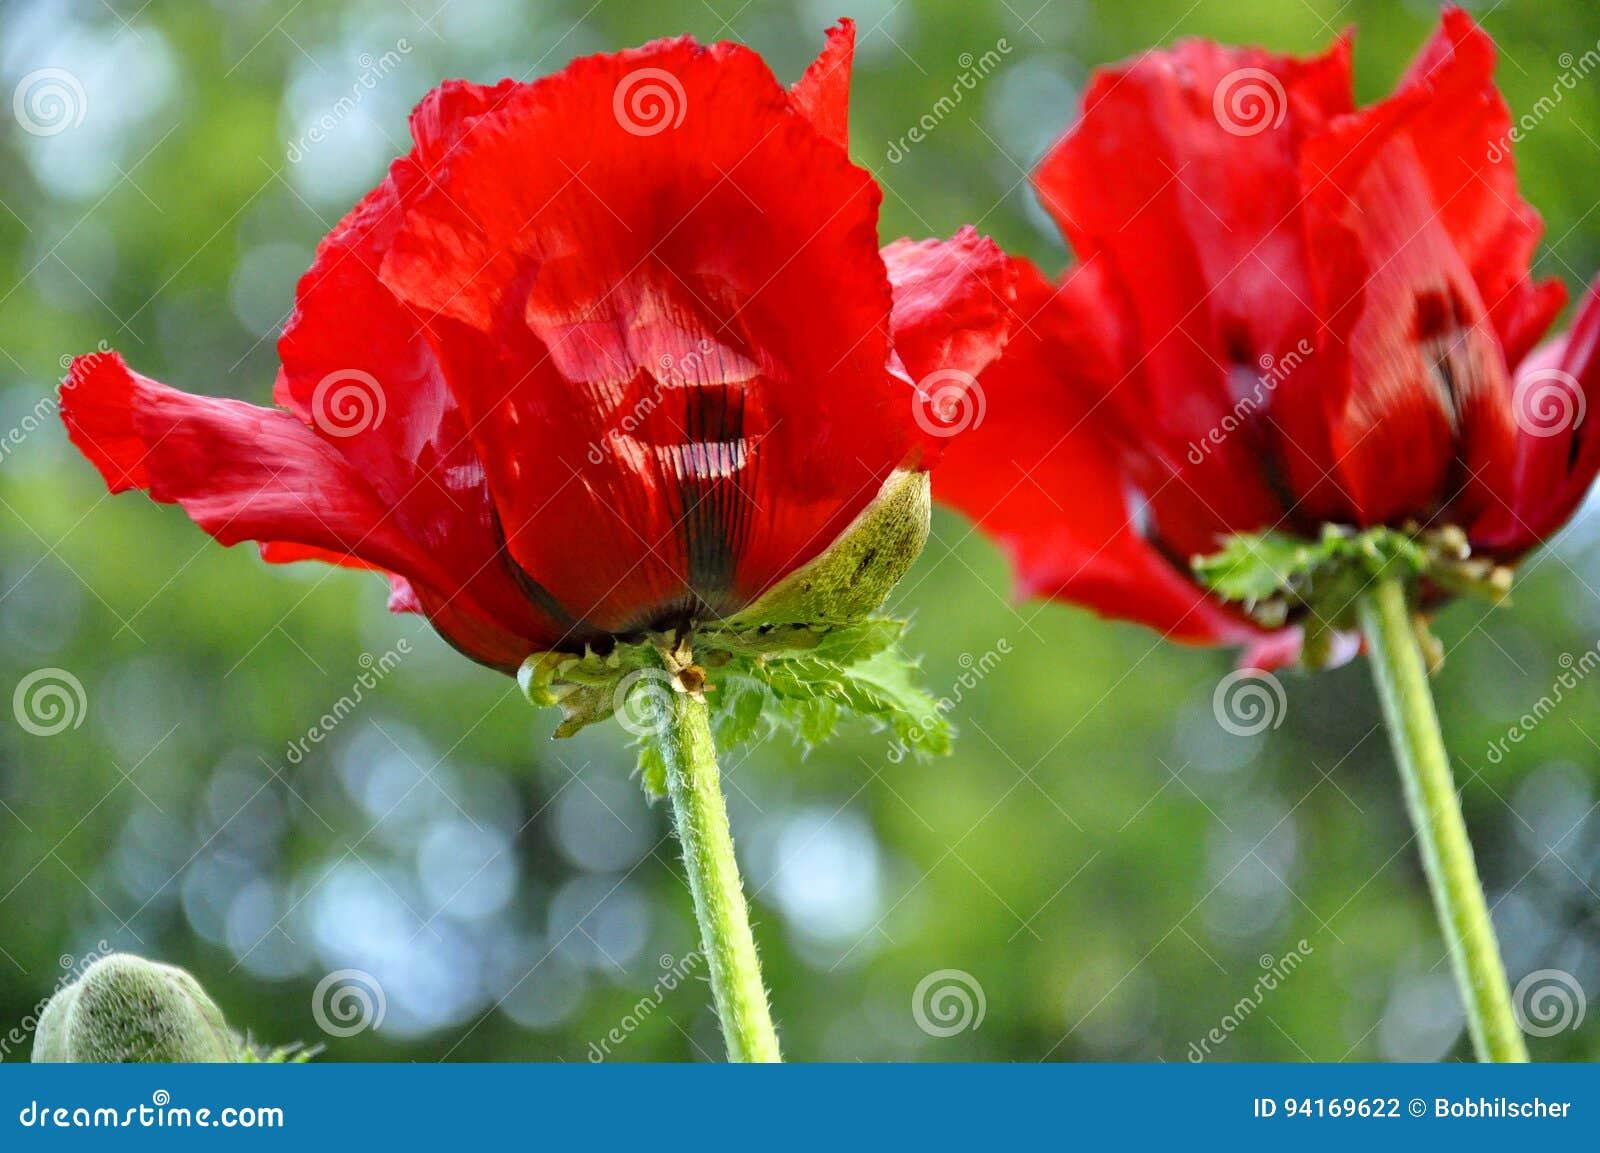 Red Oriental Poppy Flowers Stock Photo Image Of Poppy 94169622